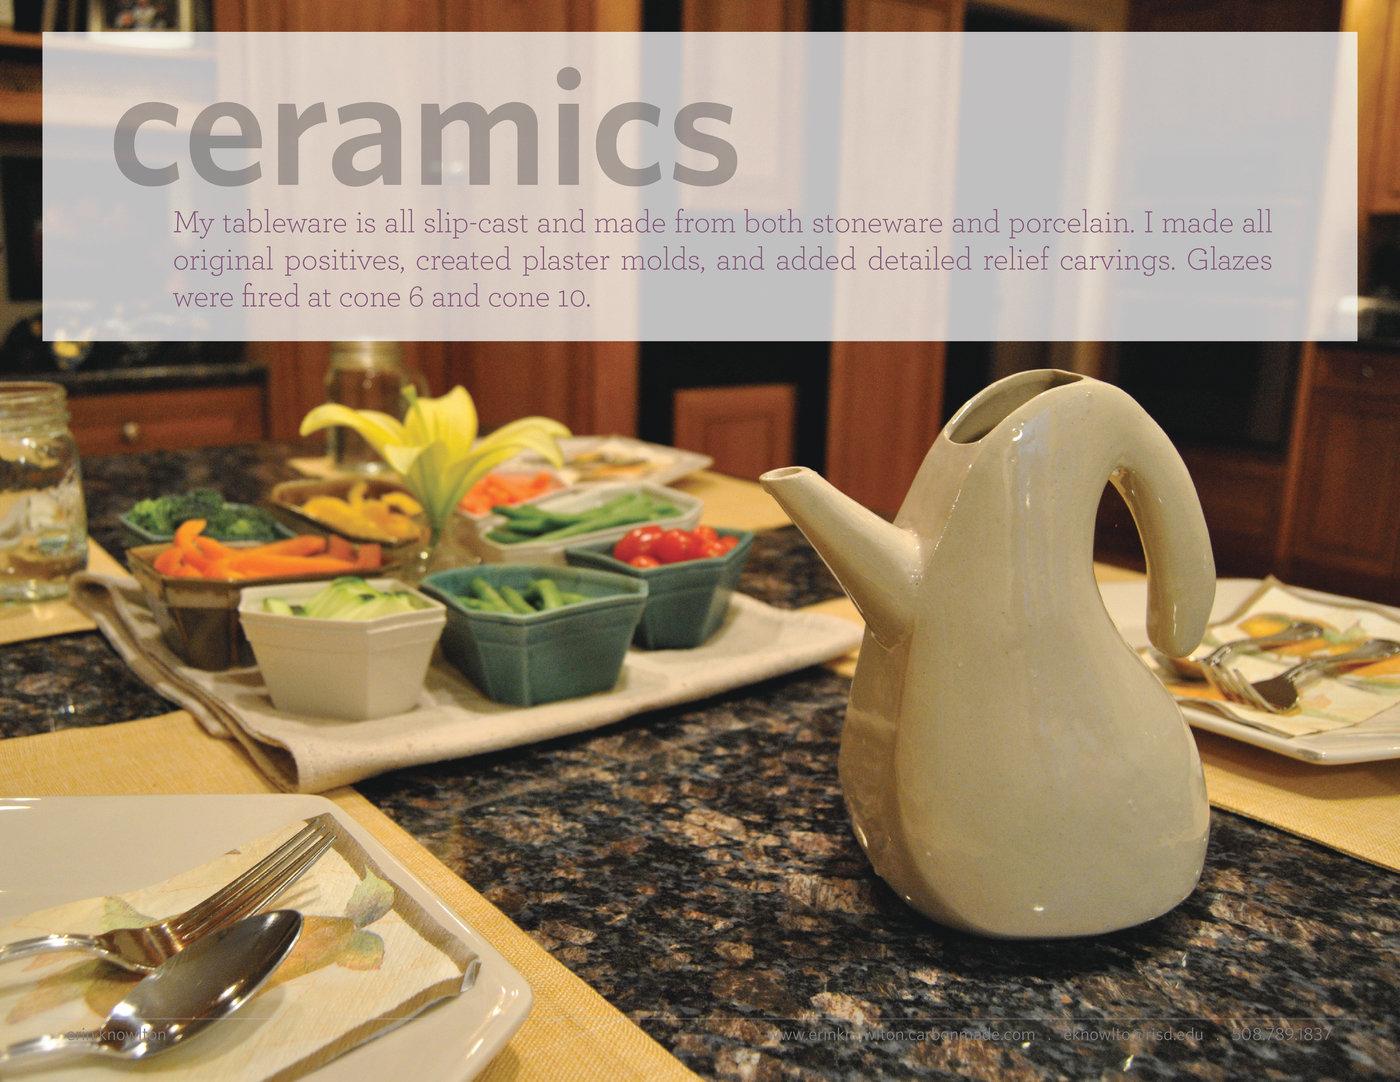 Production Ceramics by Erin Knowlton at Coroflot com